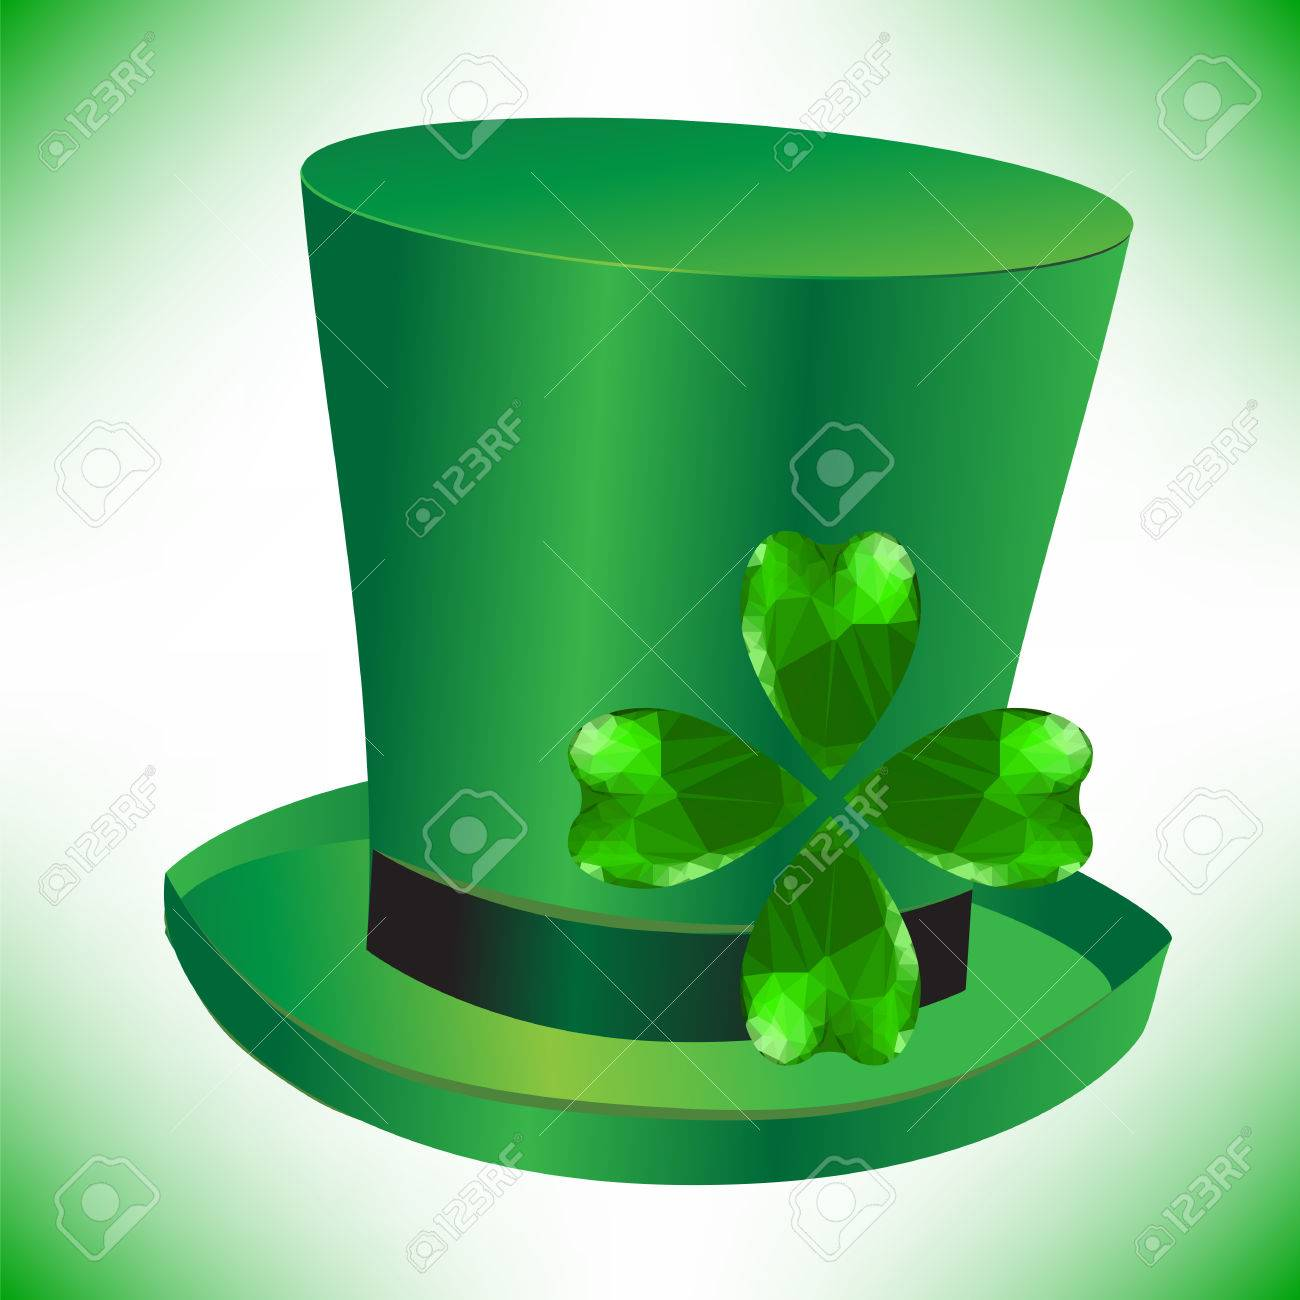 four leaf clover irish shamrock st patrick u0027s day symbol useful